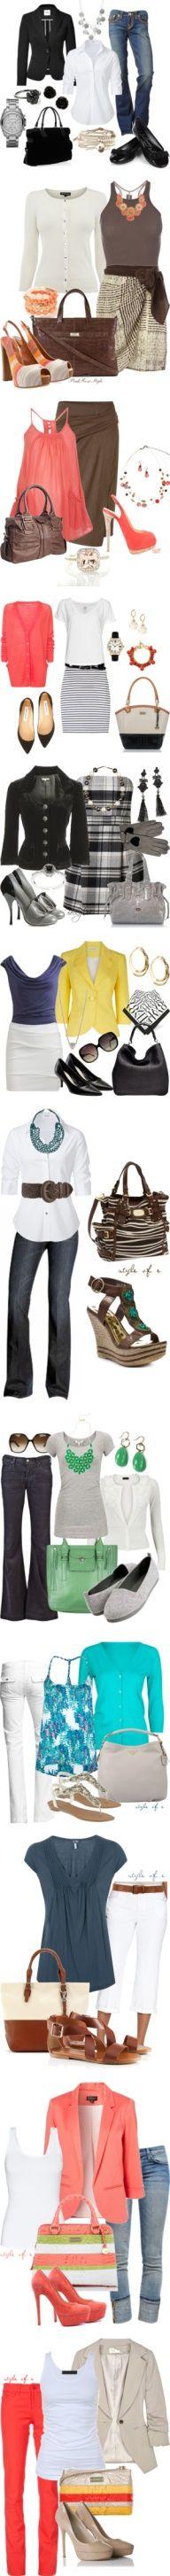 Latest fashion women summer clothing on sale for summer season 2013